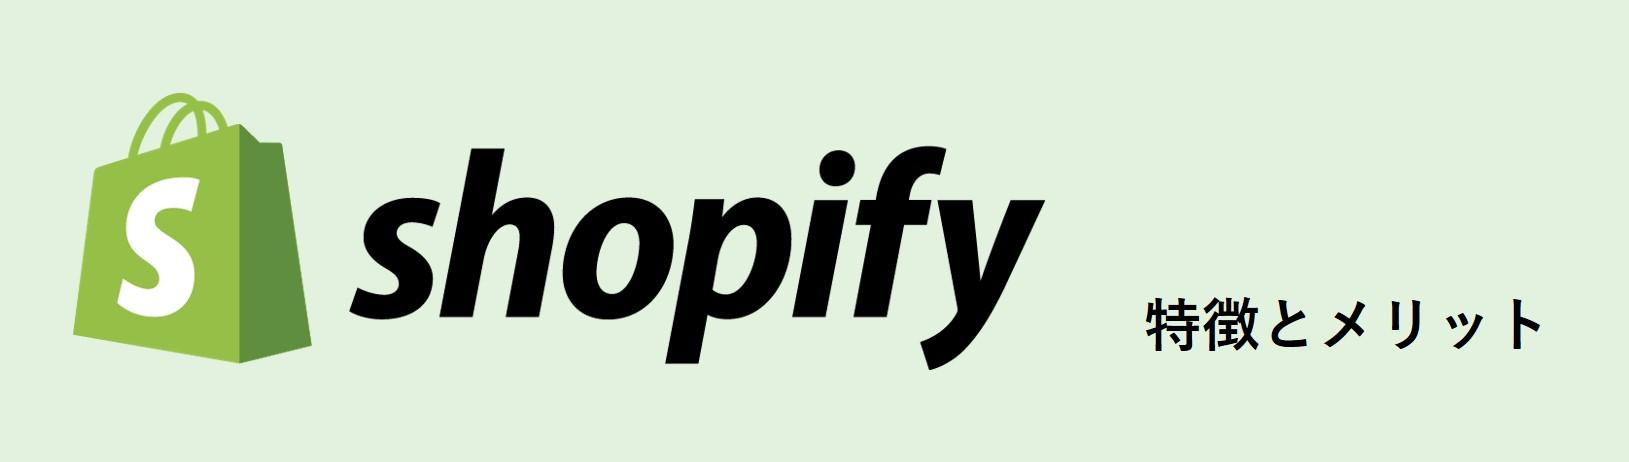 Shopifyの特徴・メリット